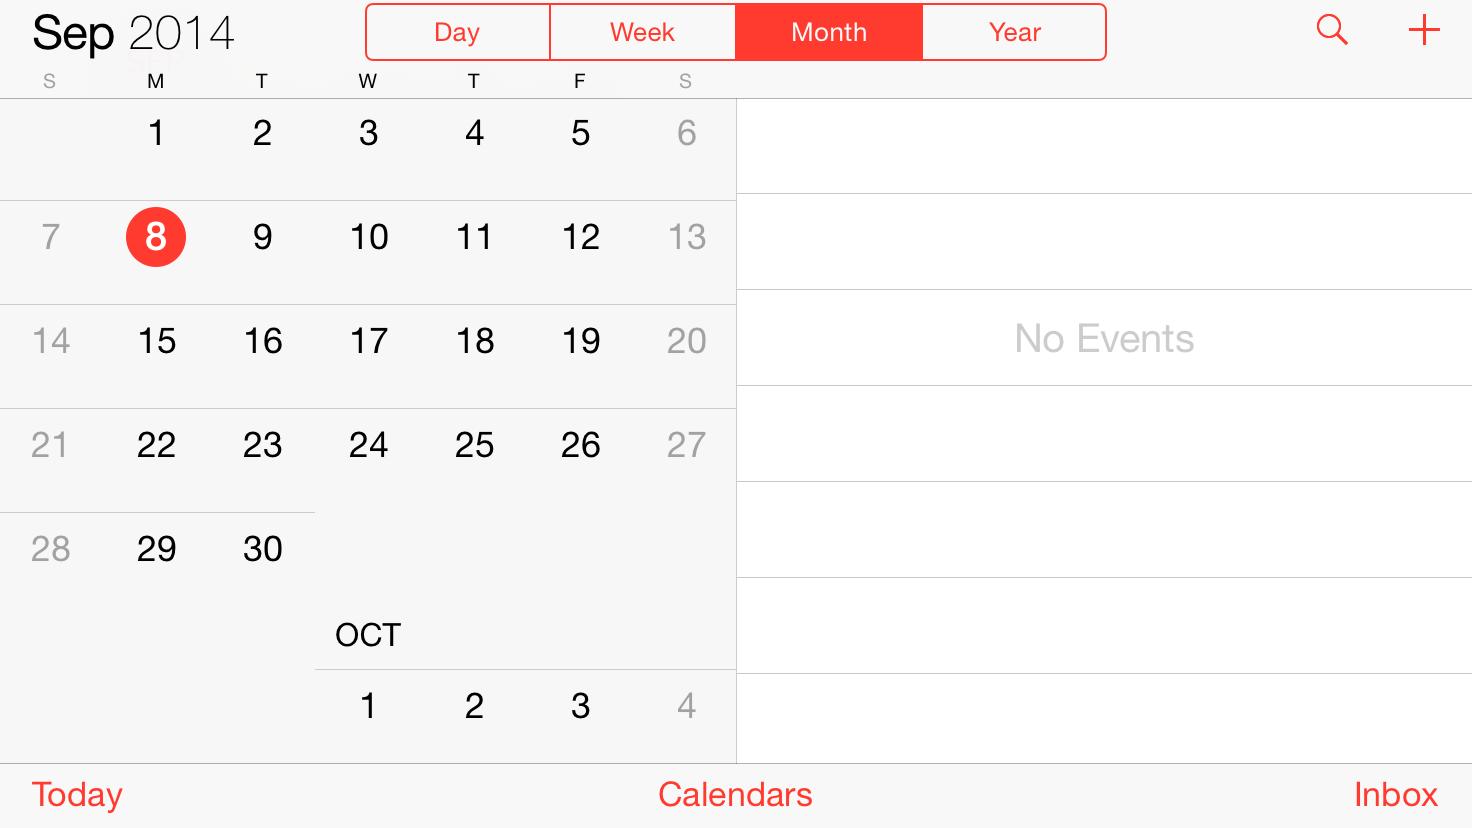 iOS Simulator Screen Shot 8 Sep 2014 04.02.01